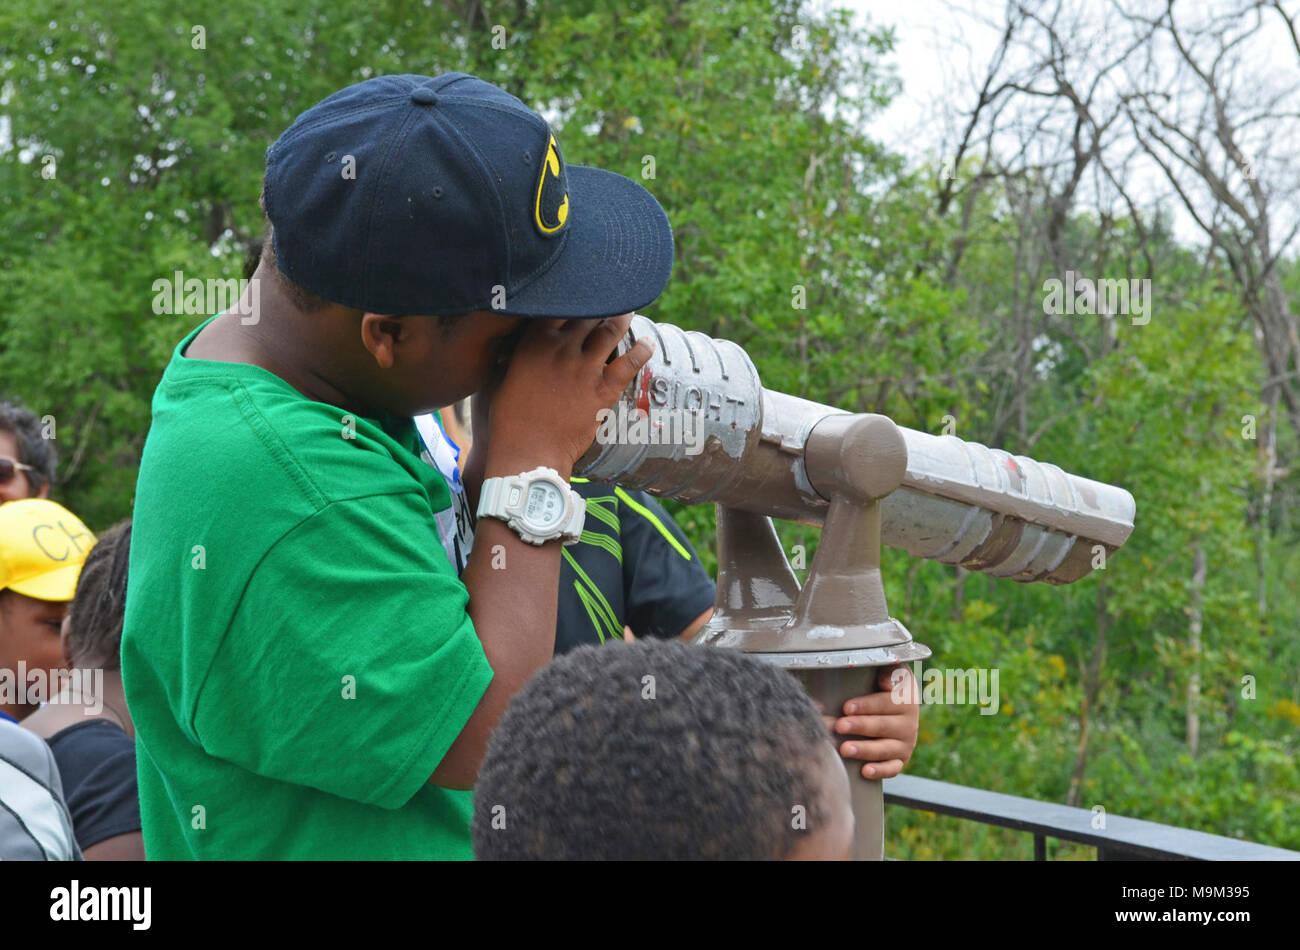 38c5c8fa7ba Birding at Minnesota Valley National Wildlife Refuge Stock Photo ...